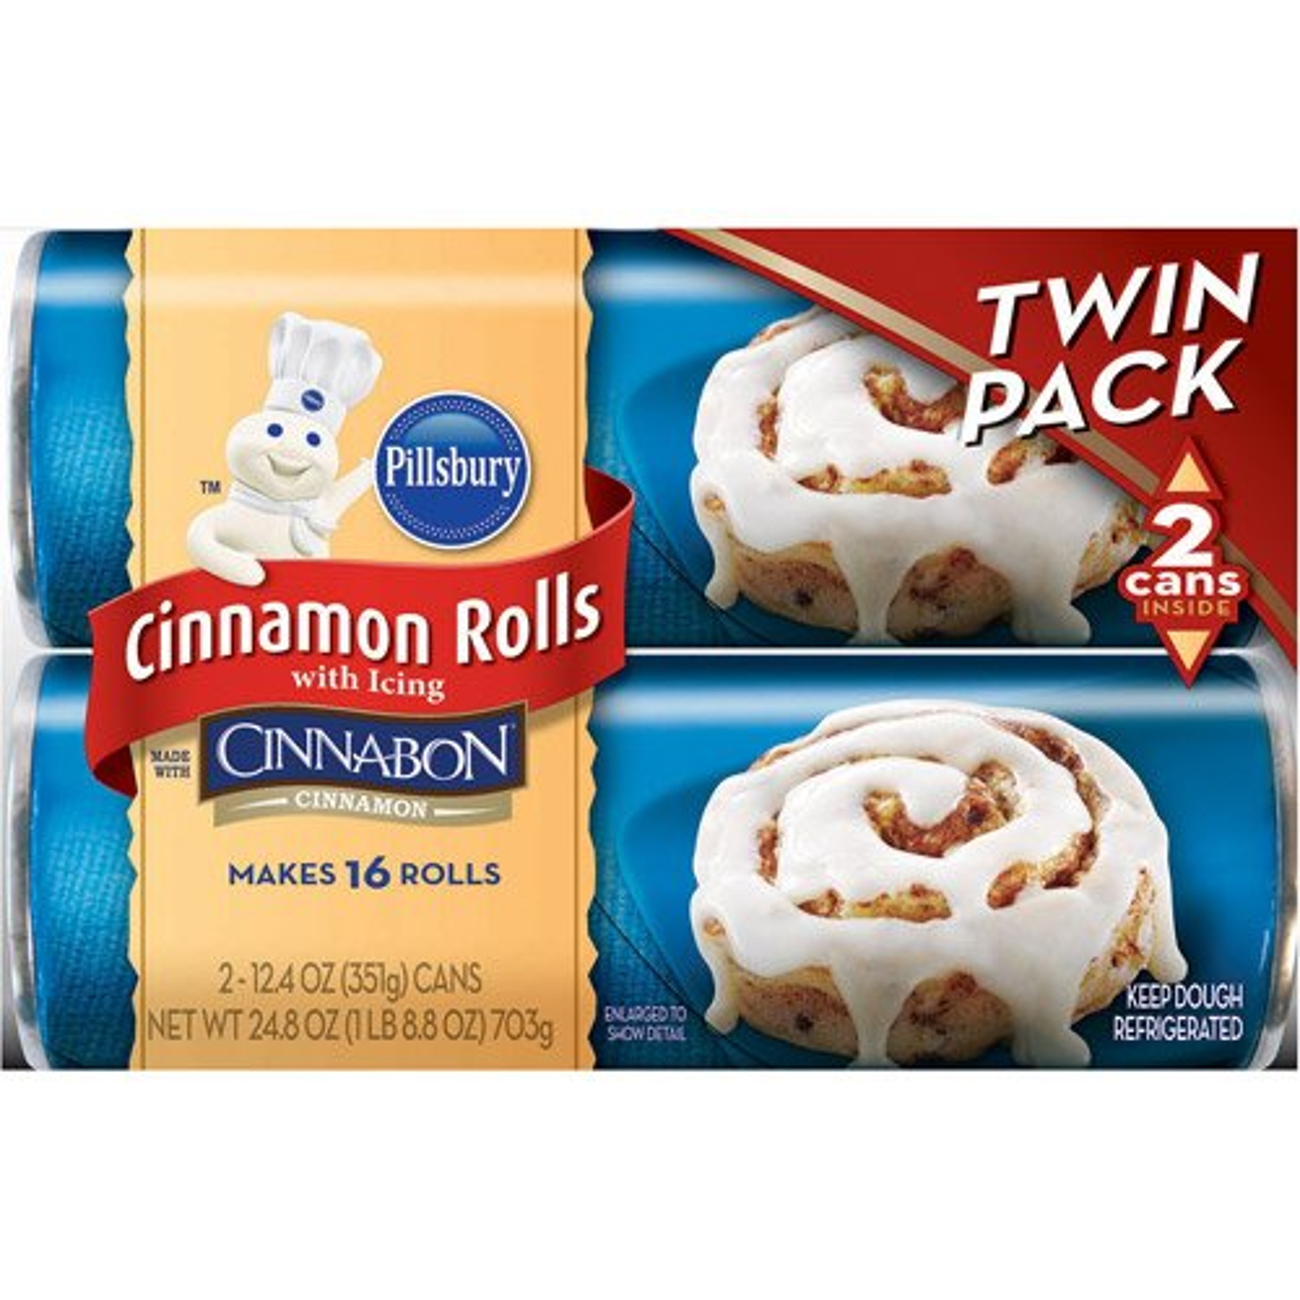 Pillsbury Cinnamon Roll with Icing Twin